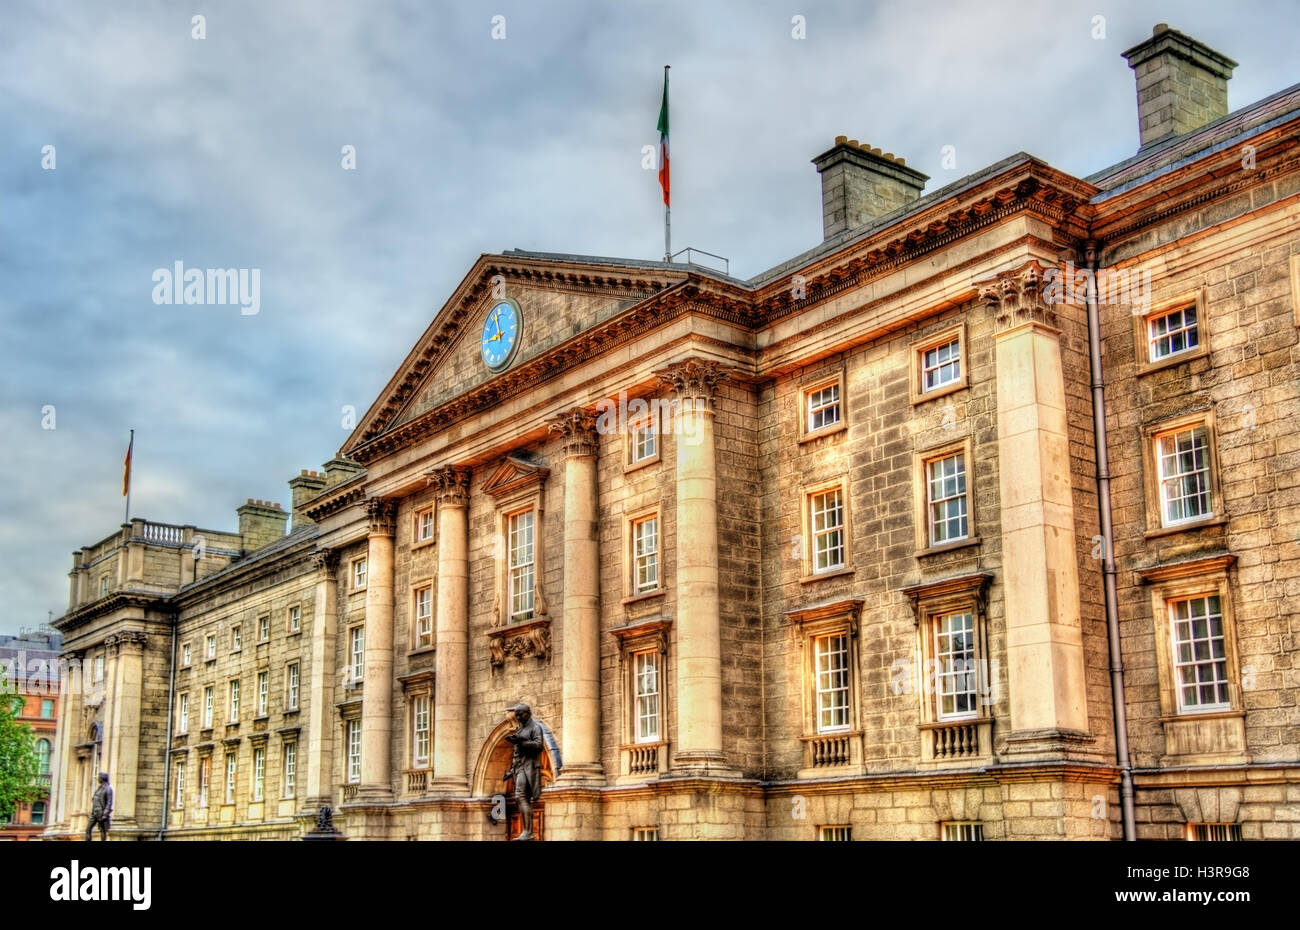 Entrance of Trinity College in Dublin - Ireland - Stock Image